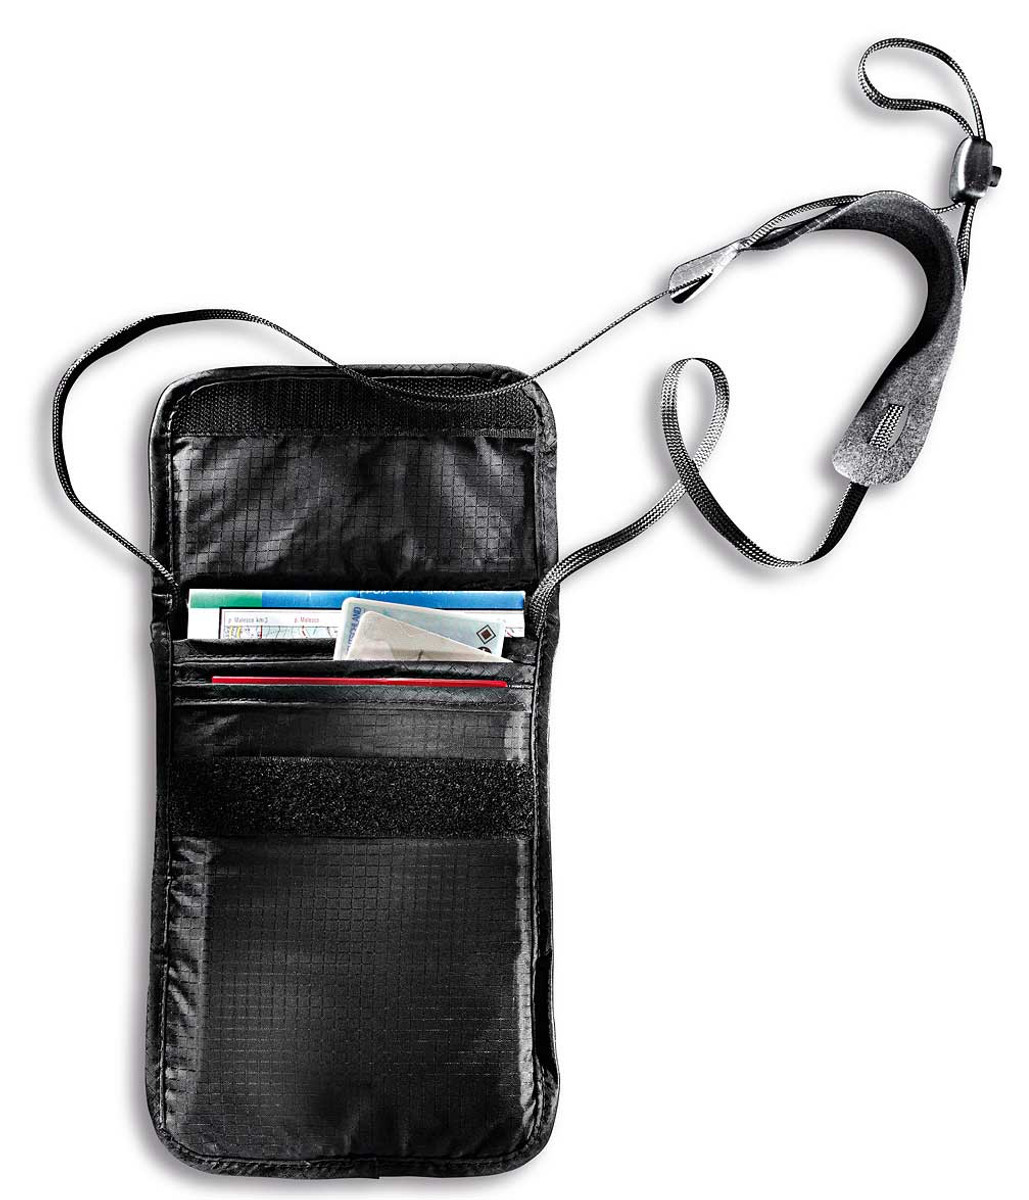 TAT 2845 Tatonka Skin Folded neck pouch, black